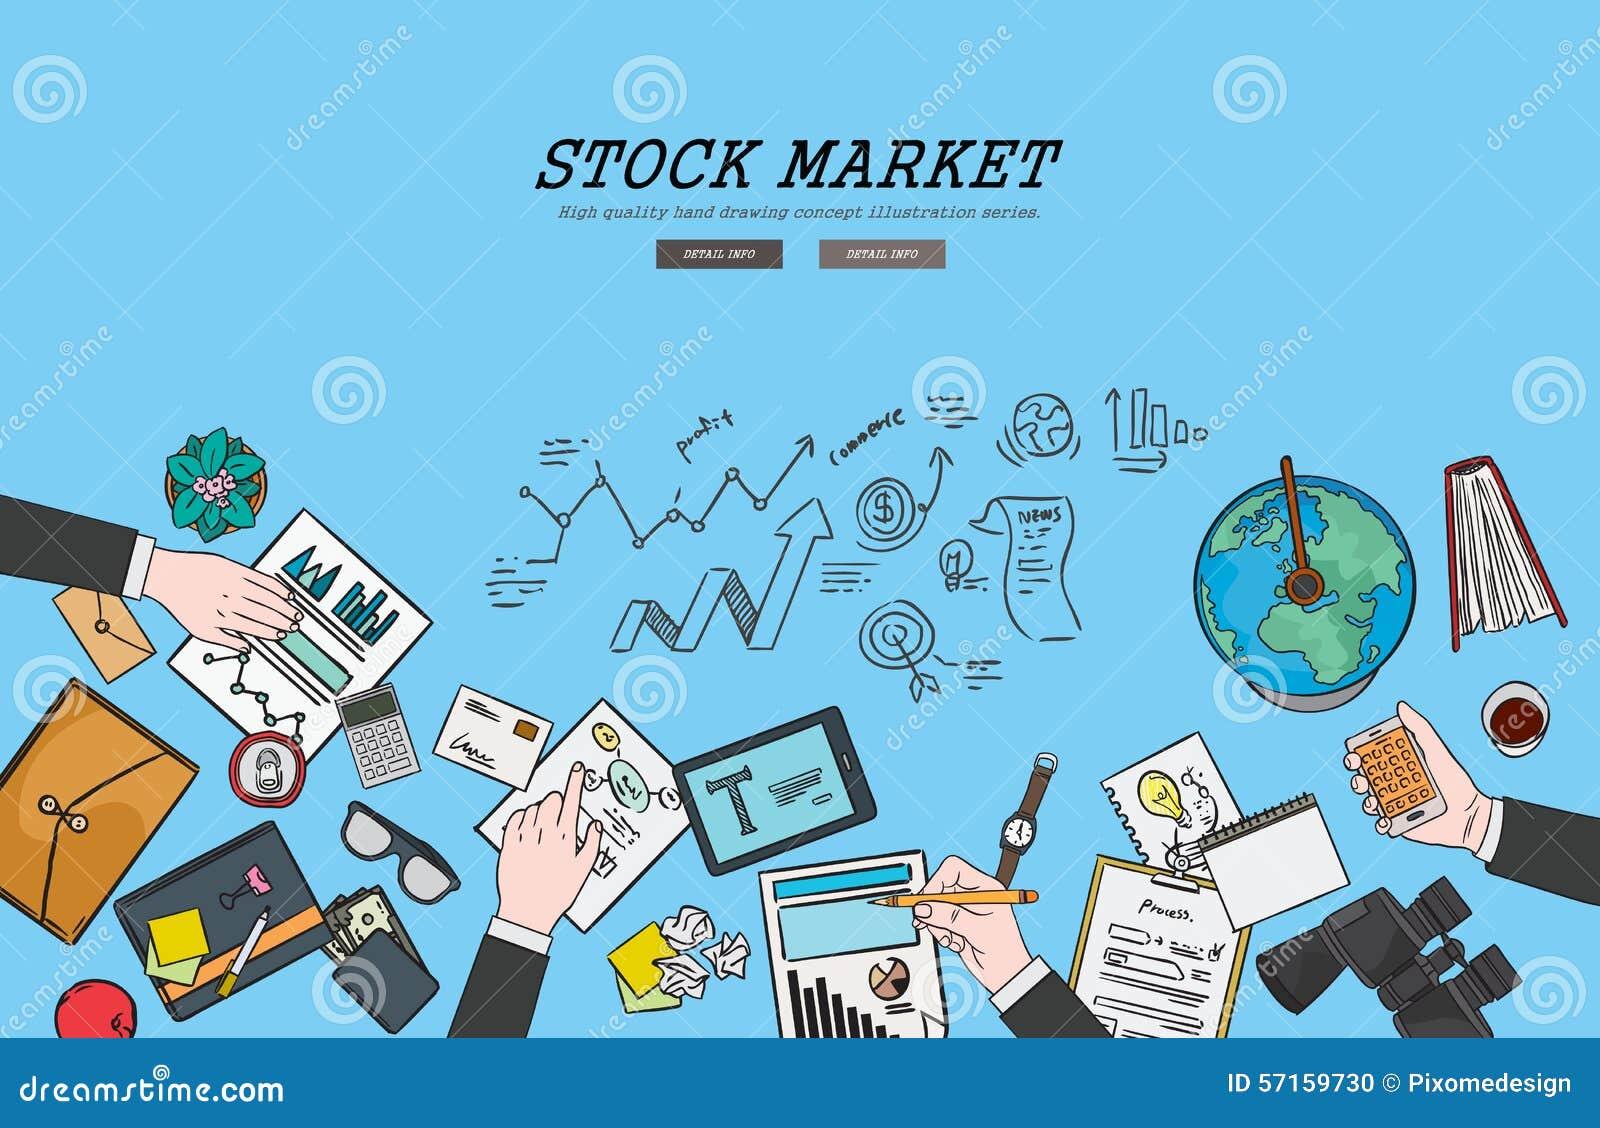 Drawing Flat Design Illustration Stock Market Concept